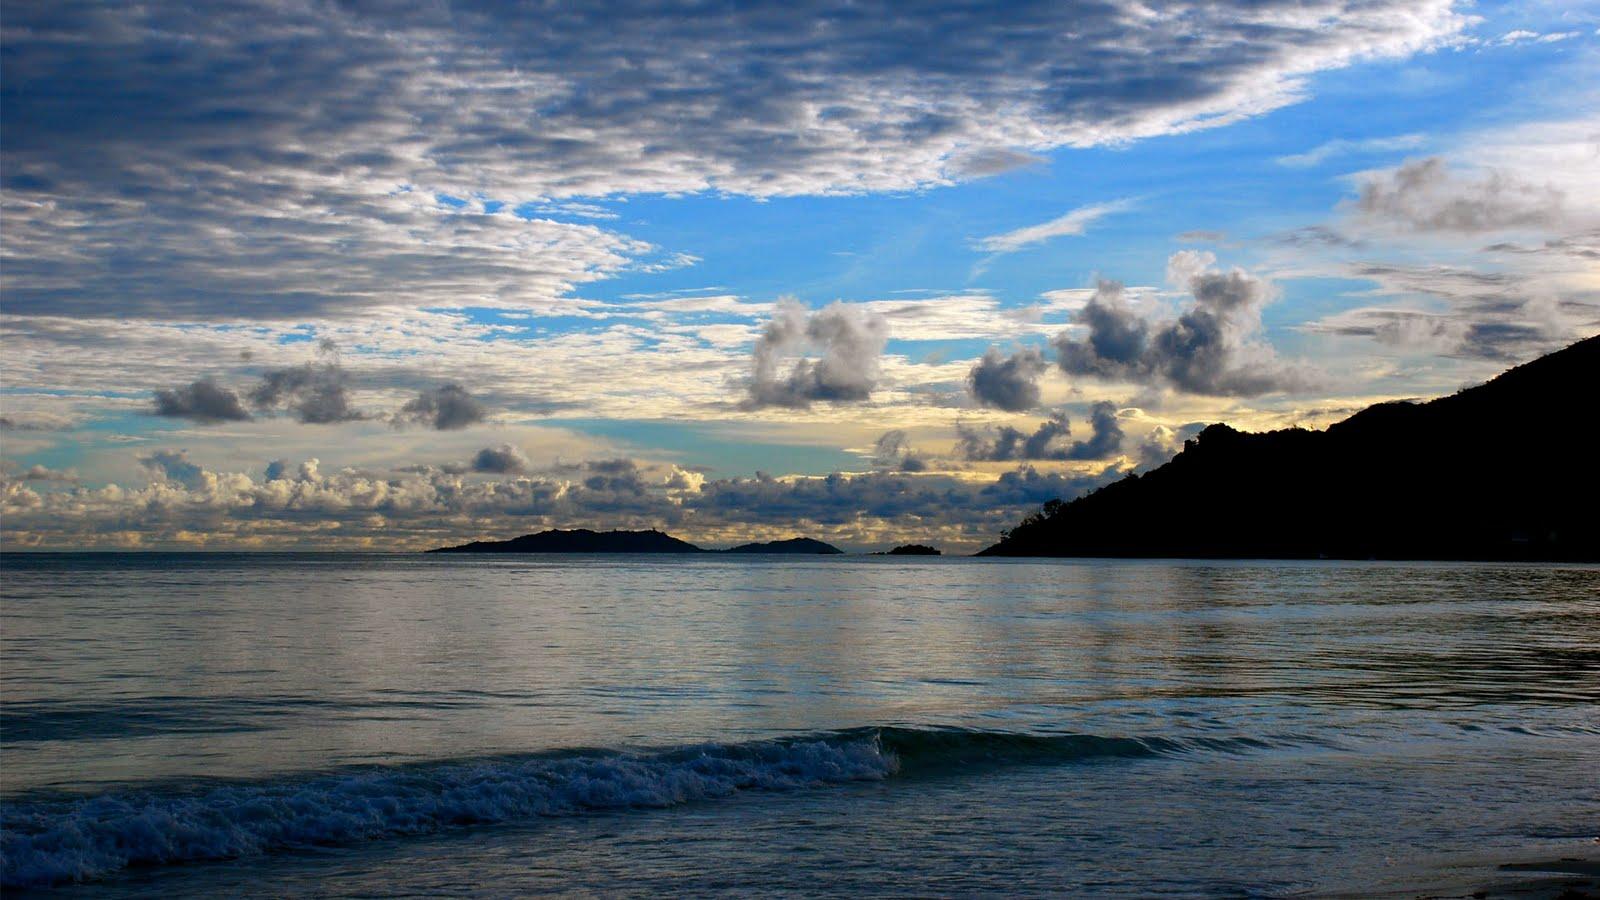 http://4.bp.blogspot.com/-bkD0oP2fzeY/UHfAcmXn3pI/AAAAAAAAAQw/2tbR_4XON4s/s1600/Free+PC+Wallpaper+Seychelles+Beautiful+Beach.jpg